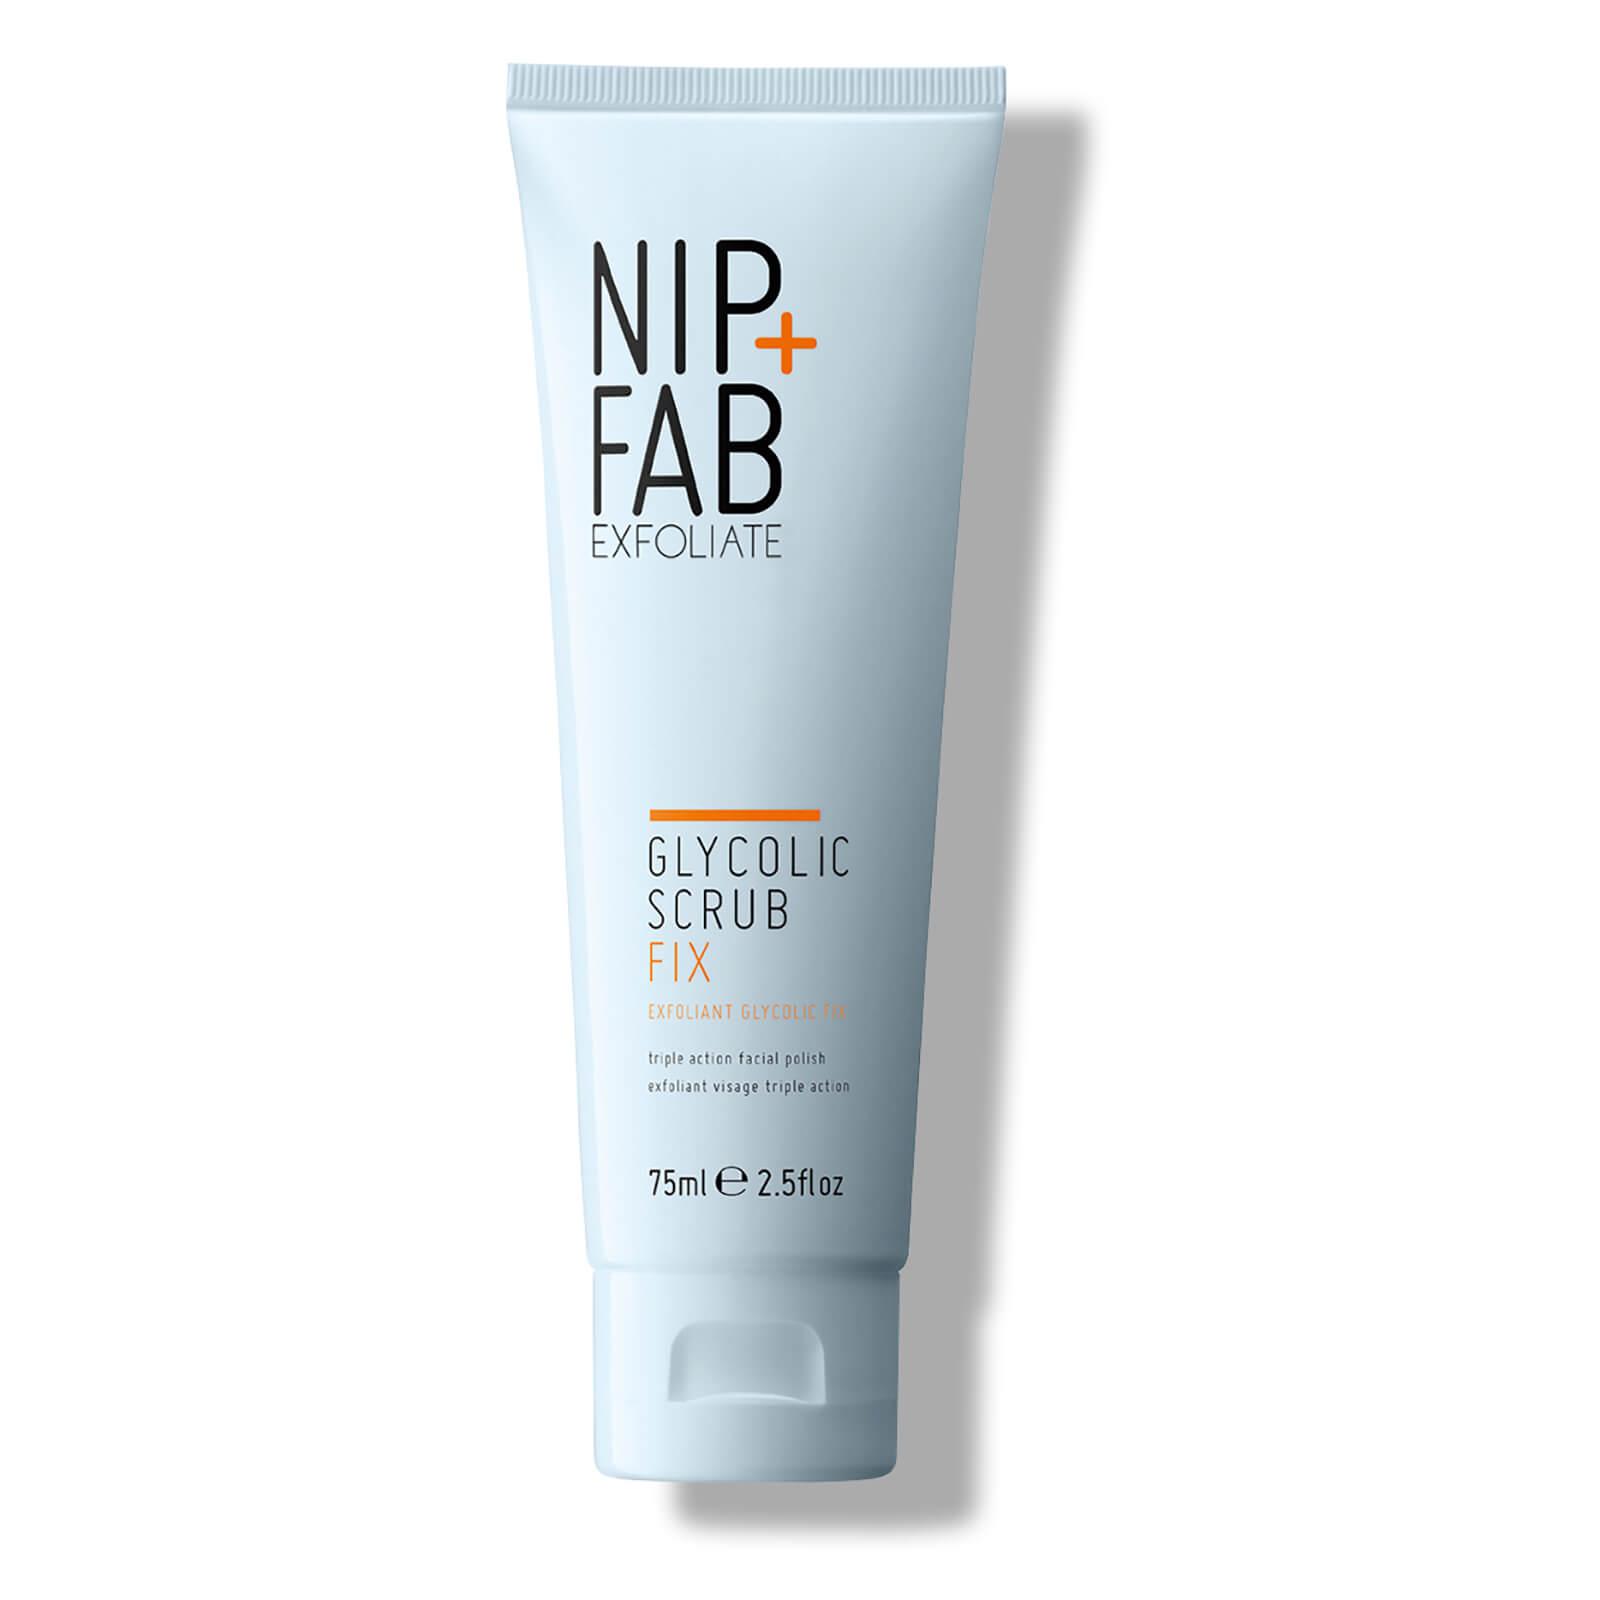 NIP+FAB Exfoliant Glycolic Fix NIP+FAB 75ml